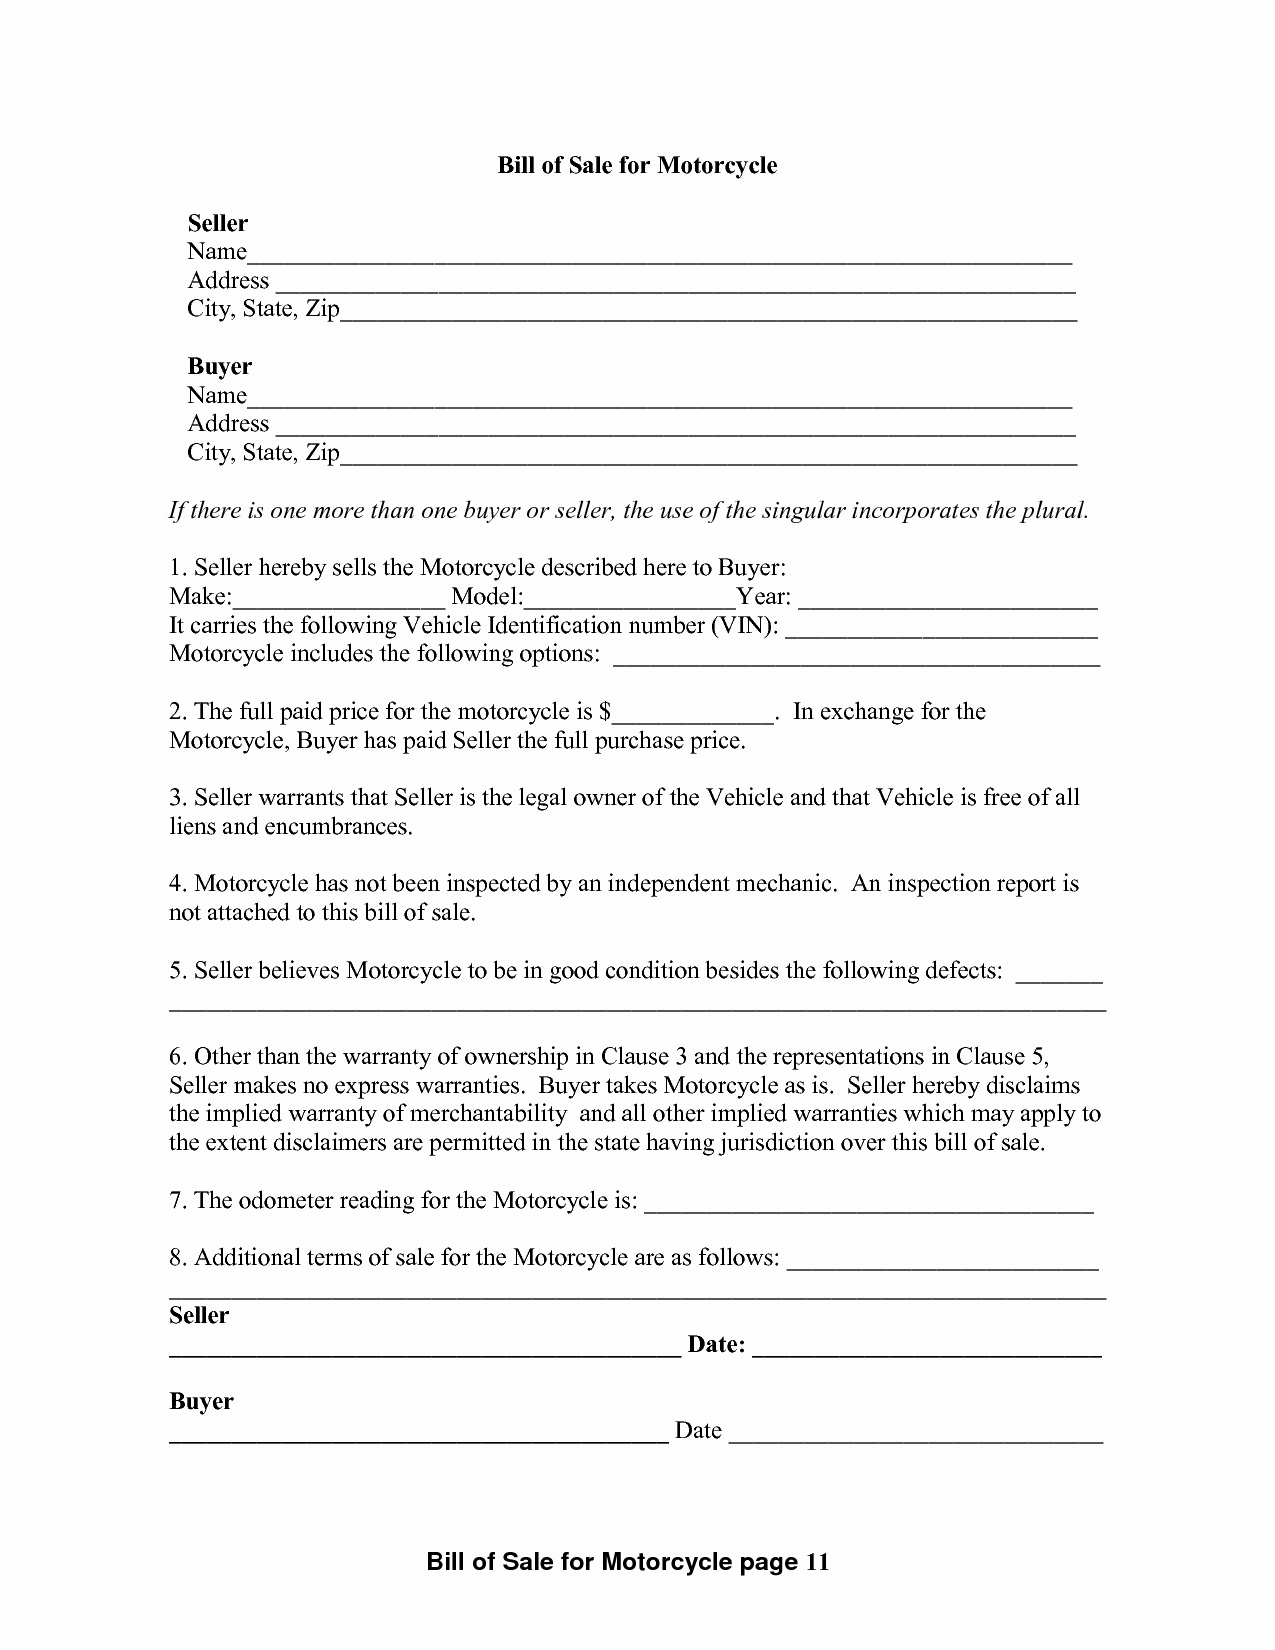 Bill Of Sale Motorcycle Pdf Luxury Free Printable Motorcycle Bill Of Sale form Generic